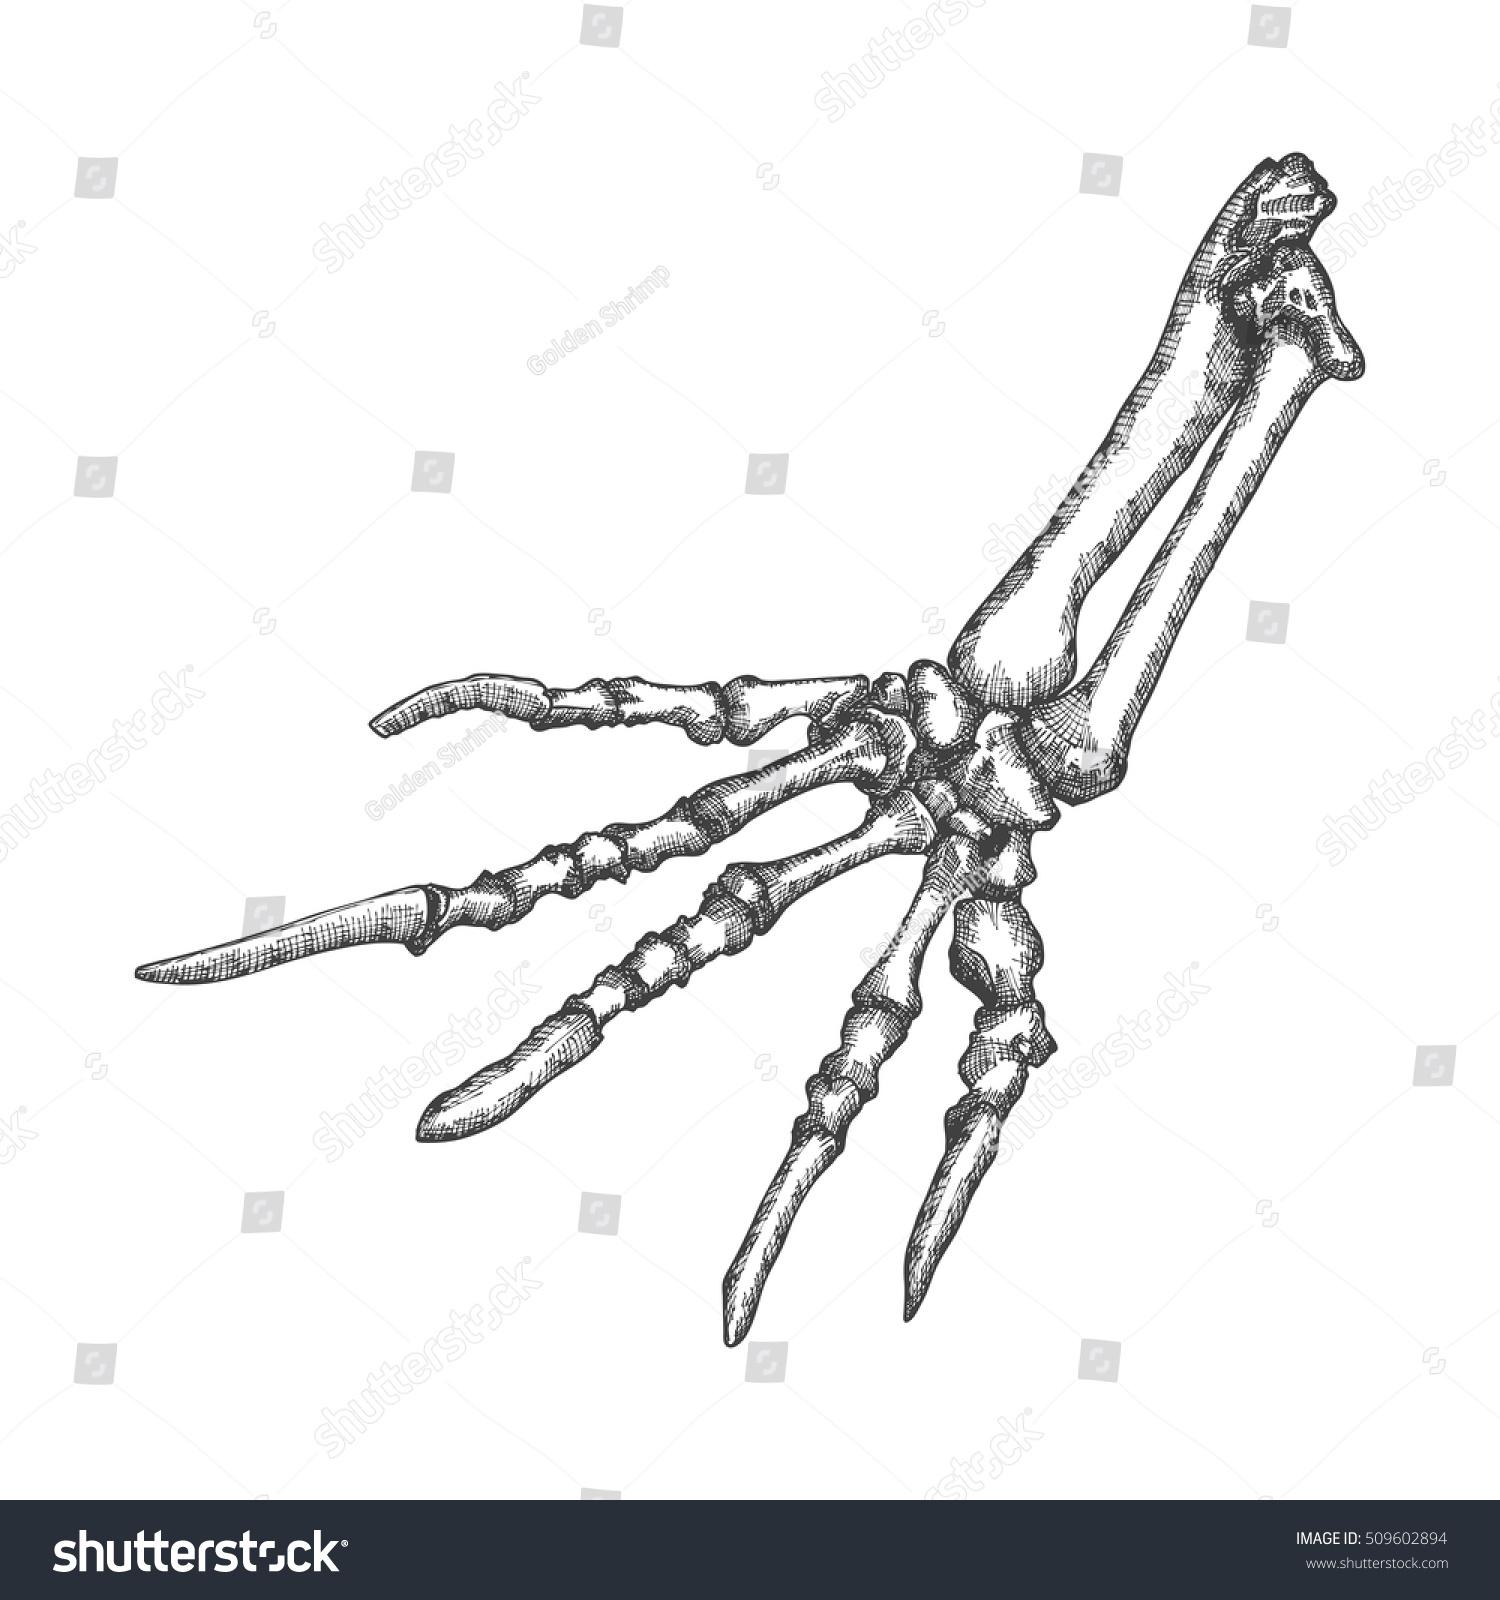 Stylized Drawing Lizard Bones Hand Decorative Stock Vector 509602894